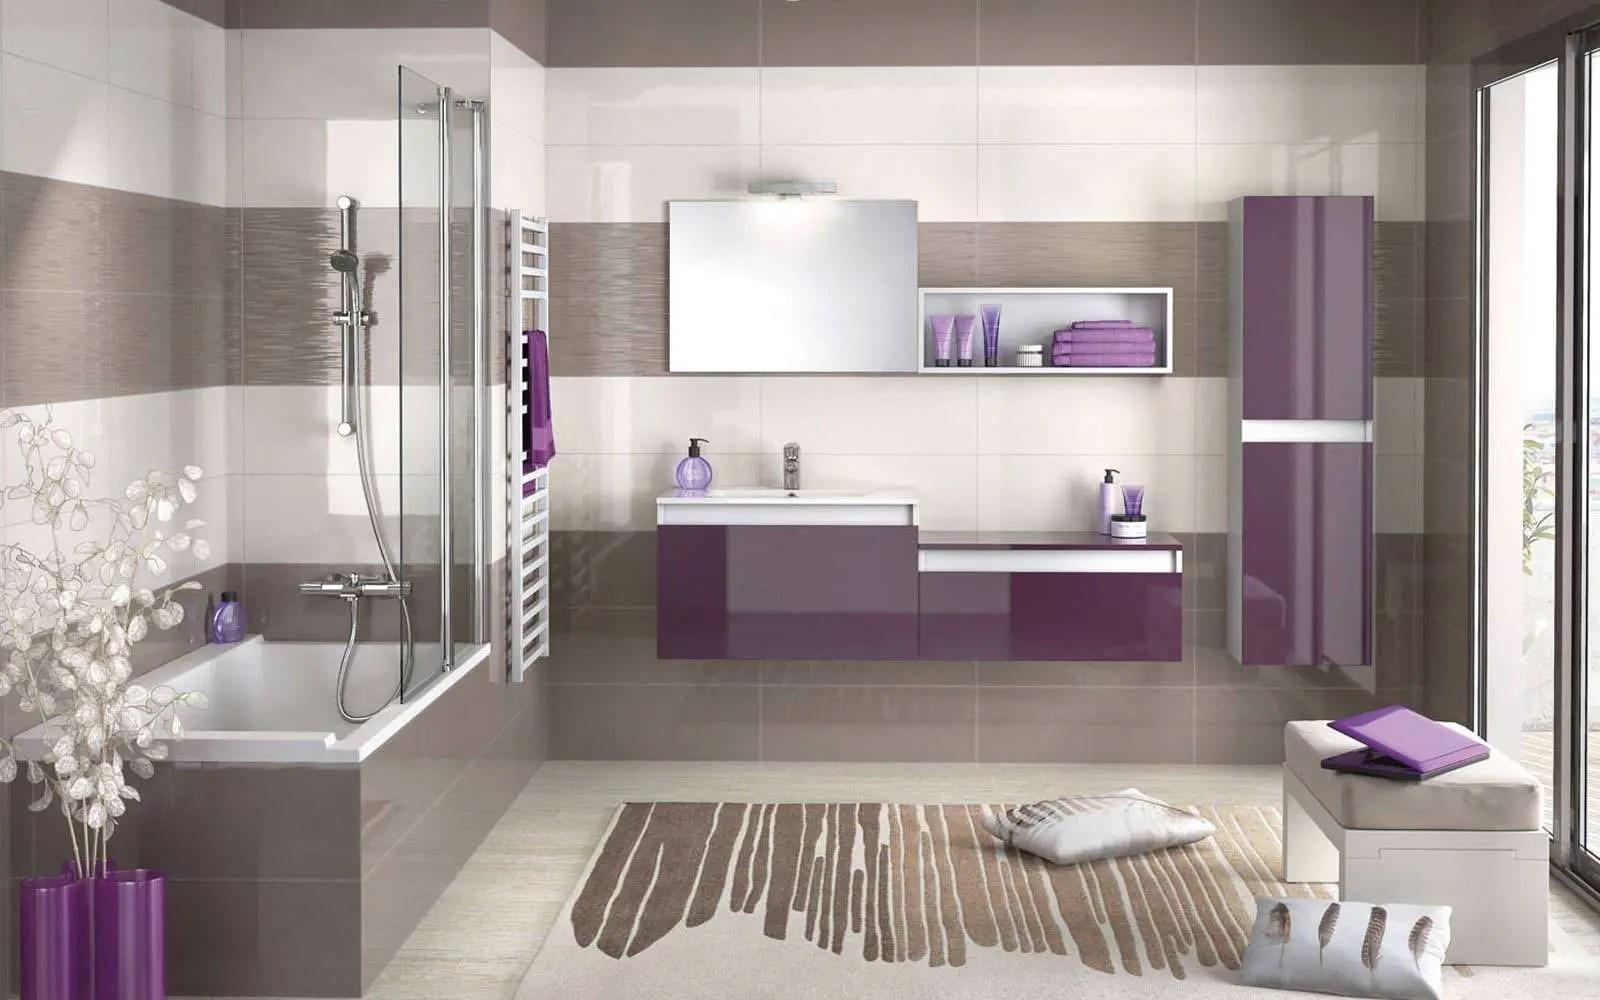 salle de bain rose poudr awesome salle de bain accessoires quebec gallery house design. Black Bedroom Furniture Sets. Home Design Ideas